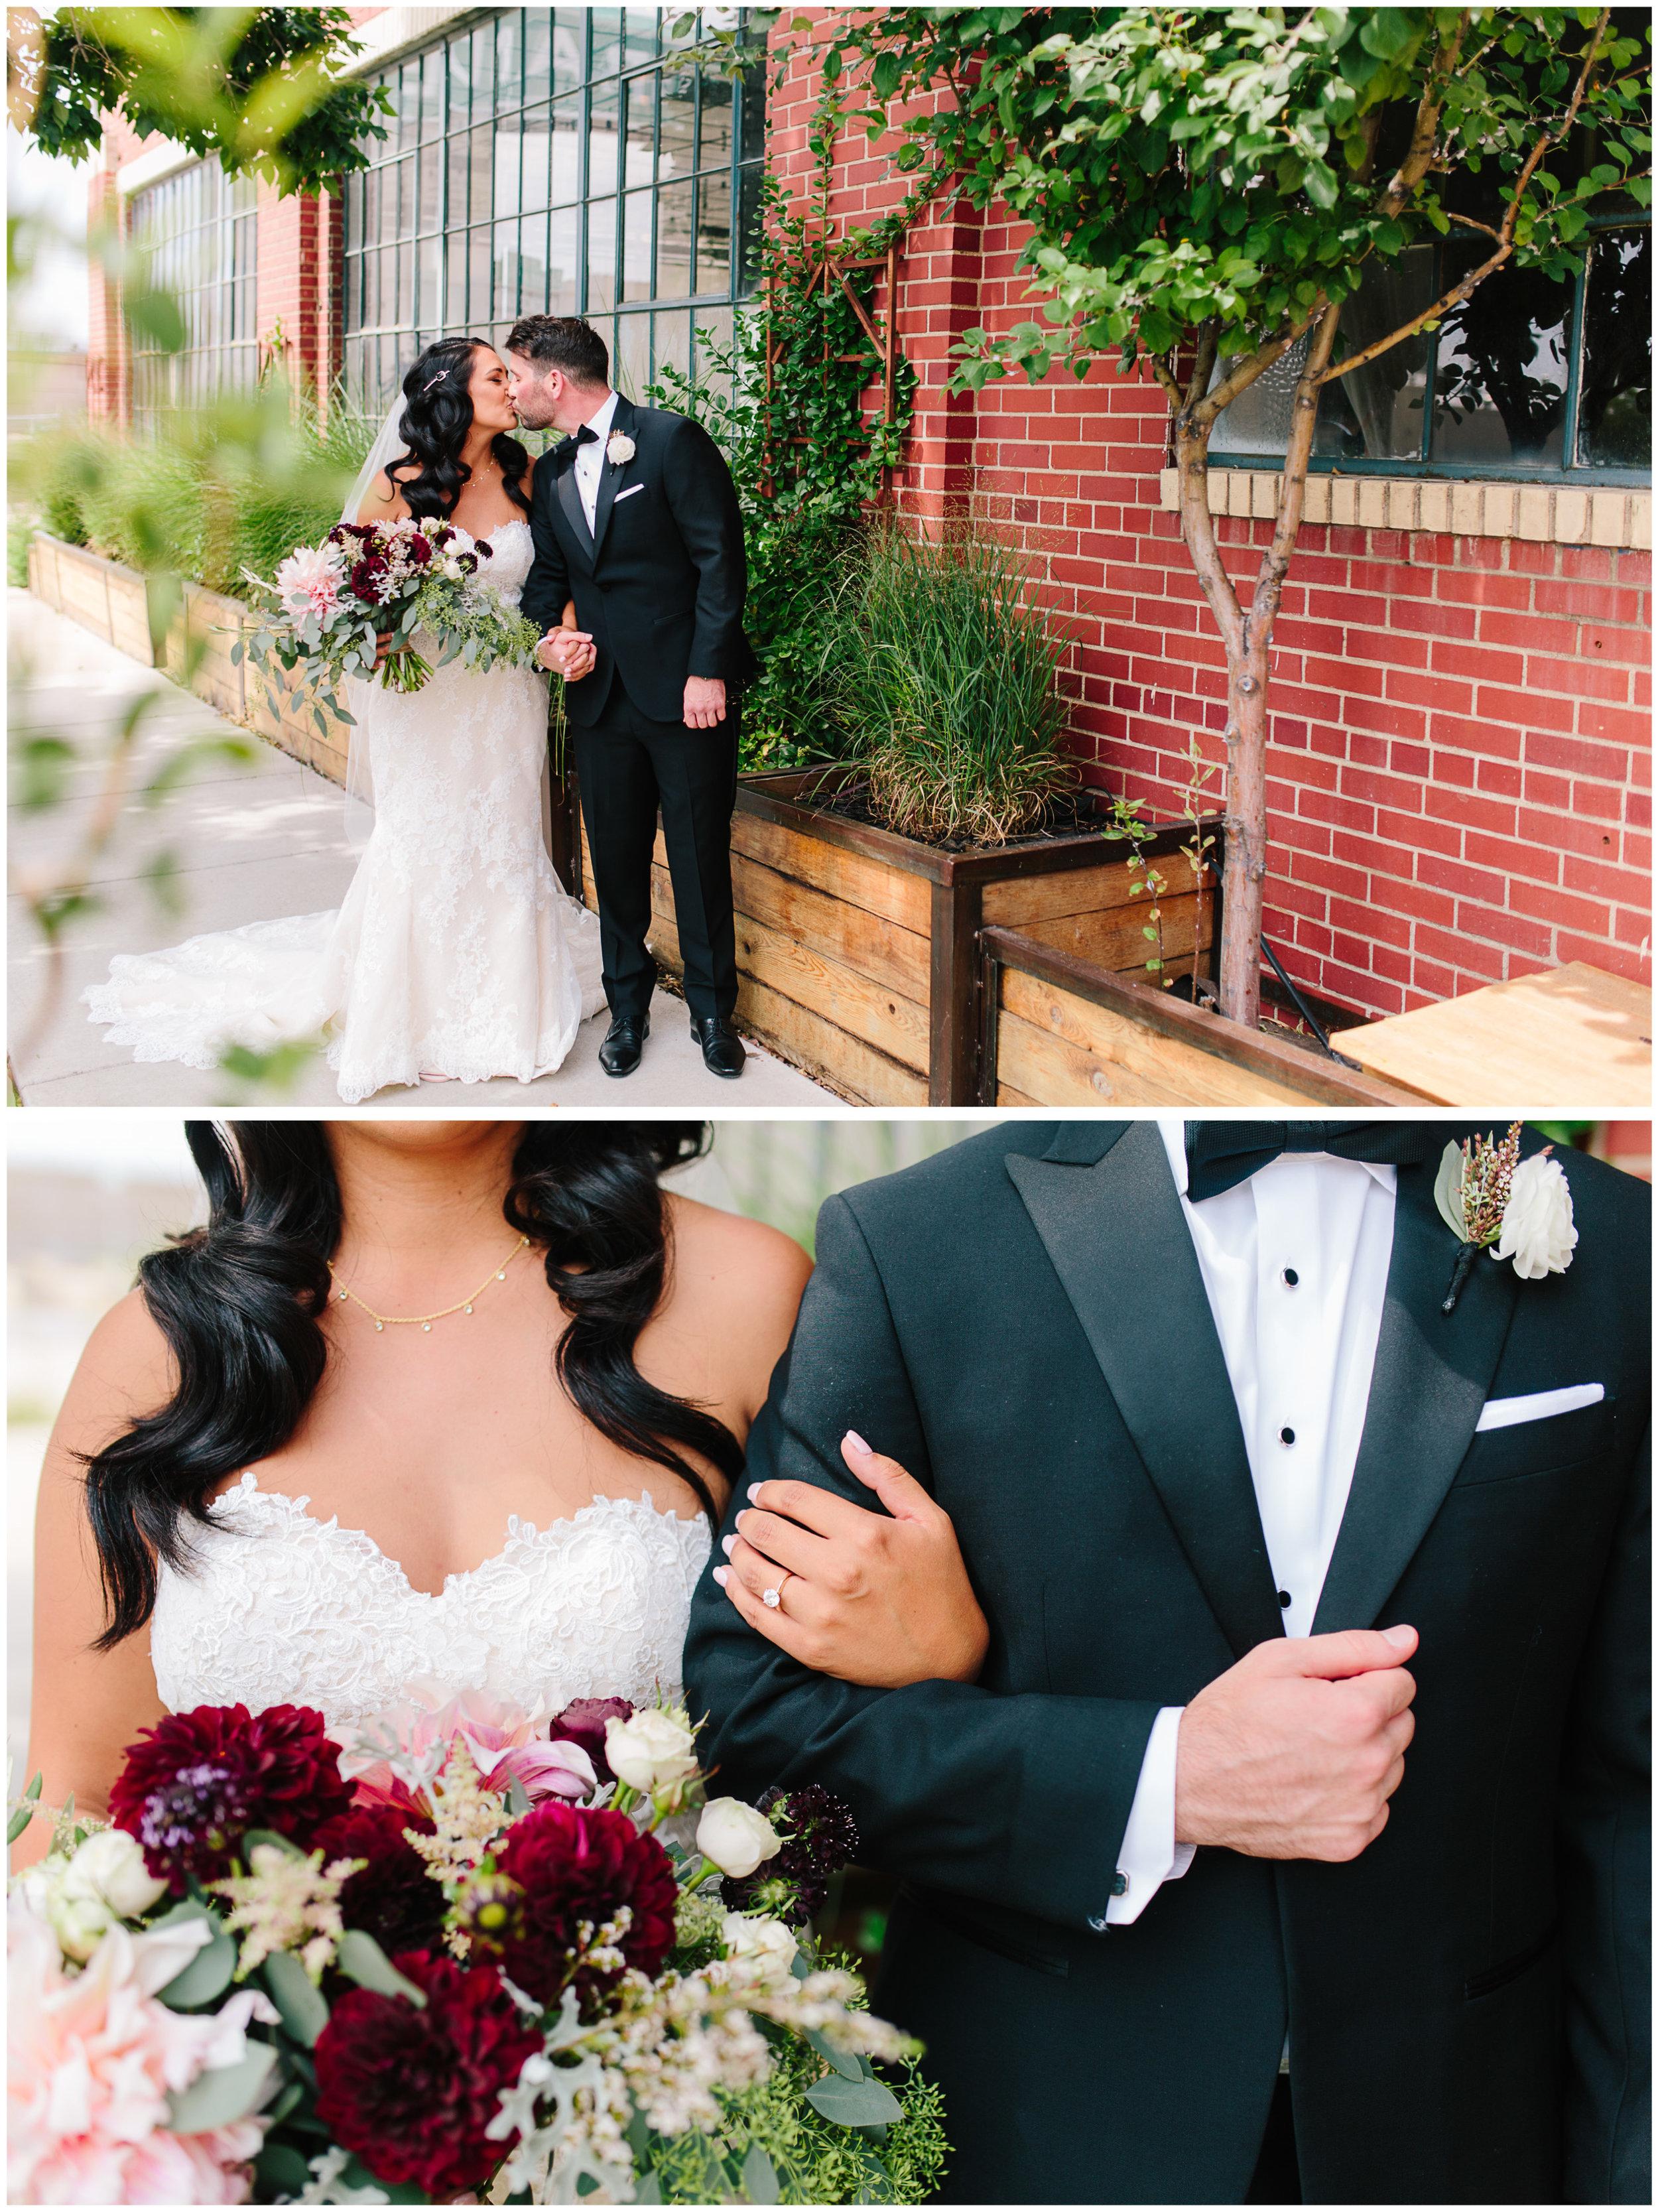 moss_denver_wedding_23.jpg